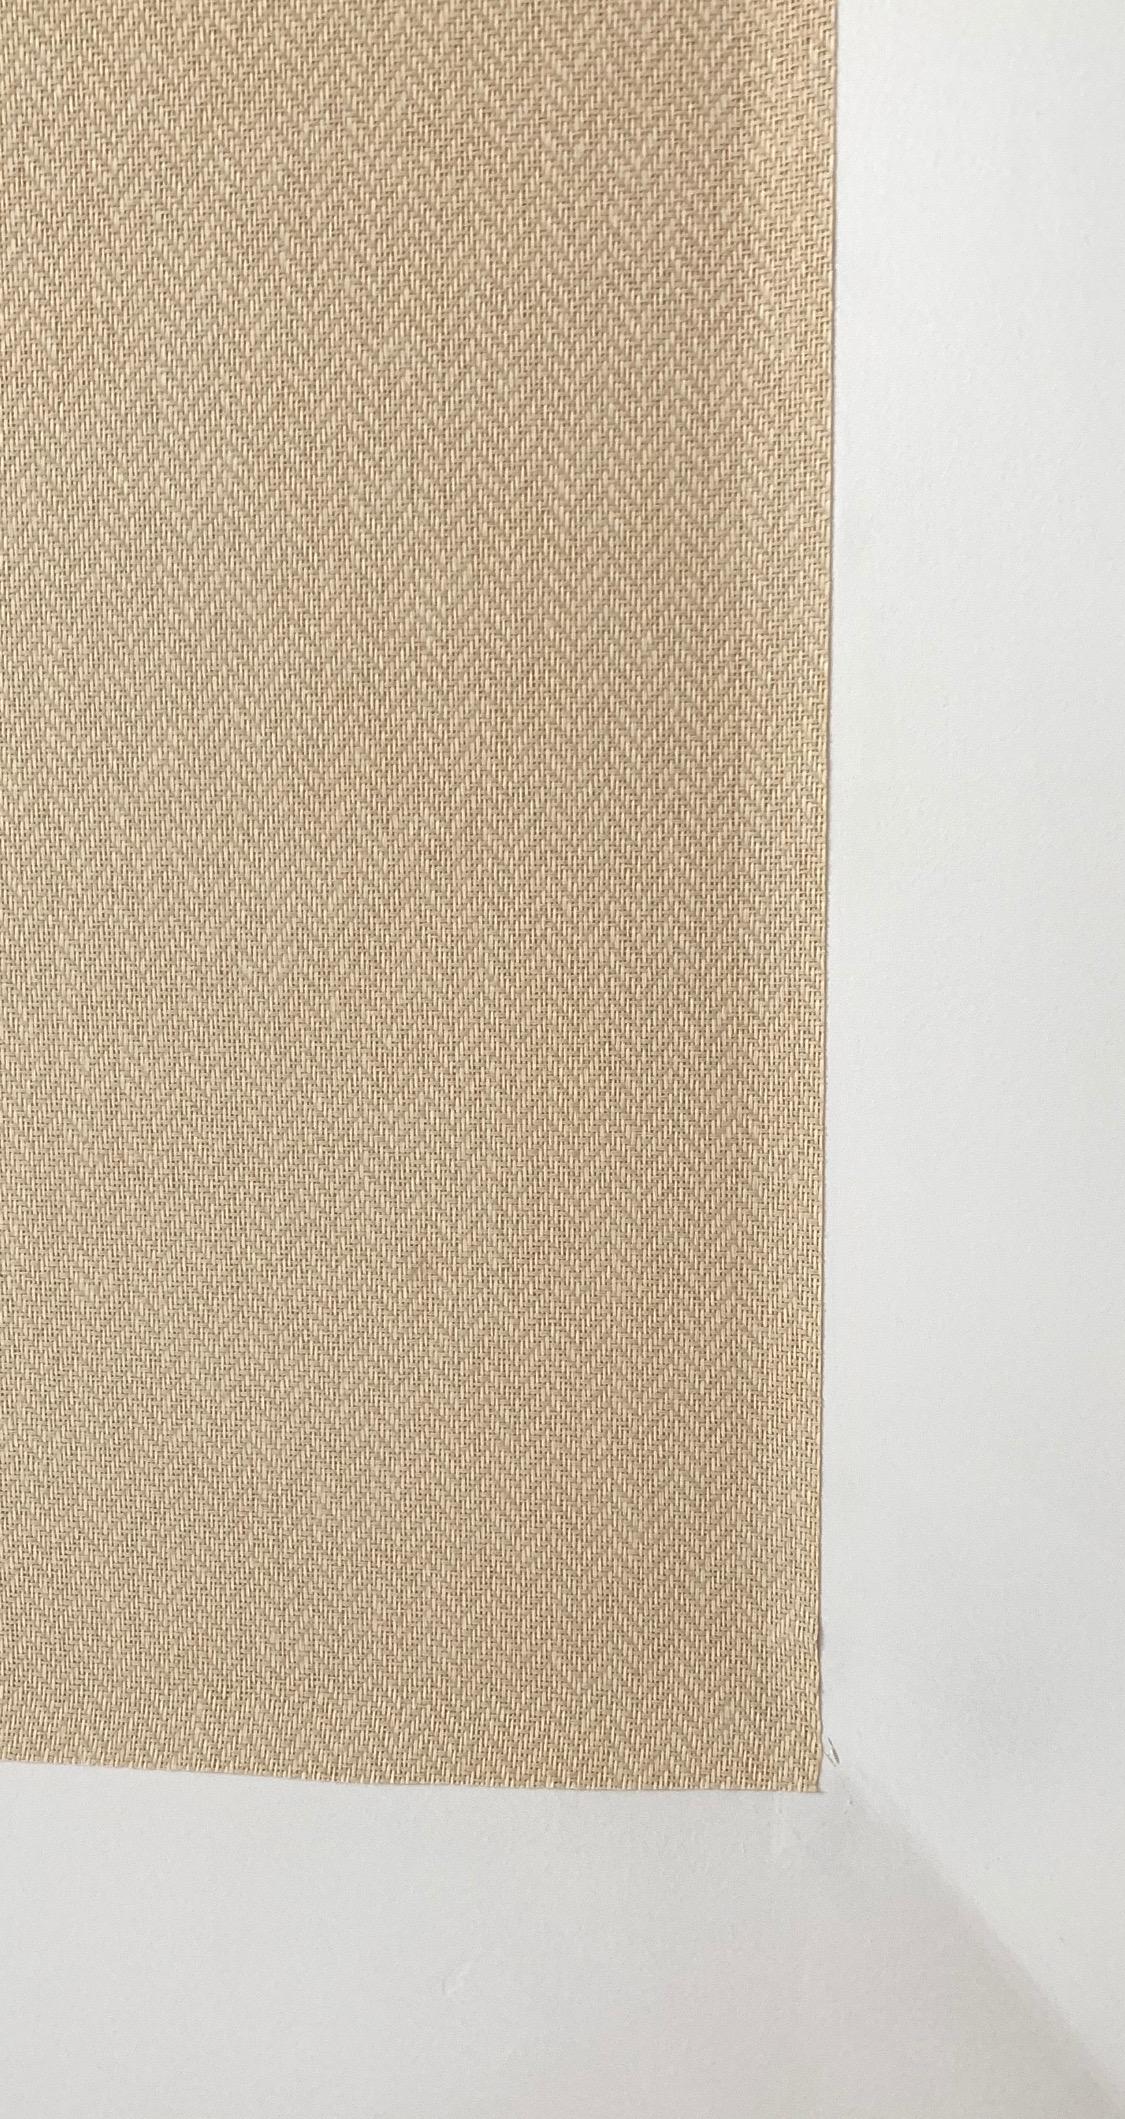 herringbone grasscloth wall covering